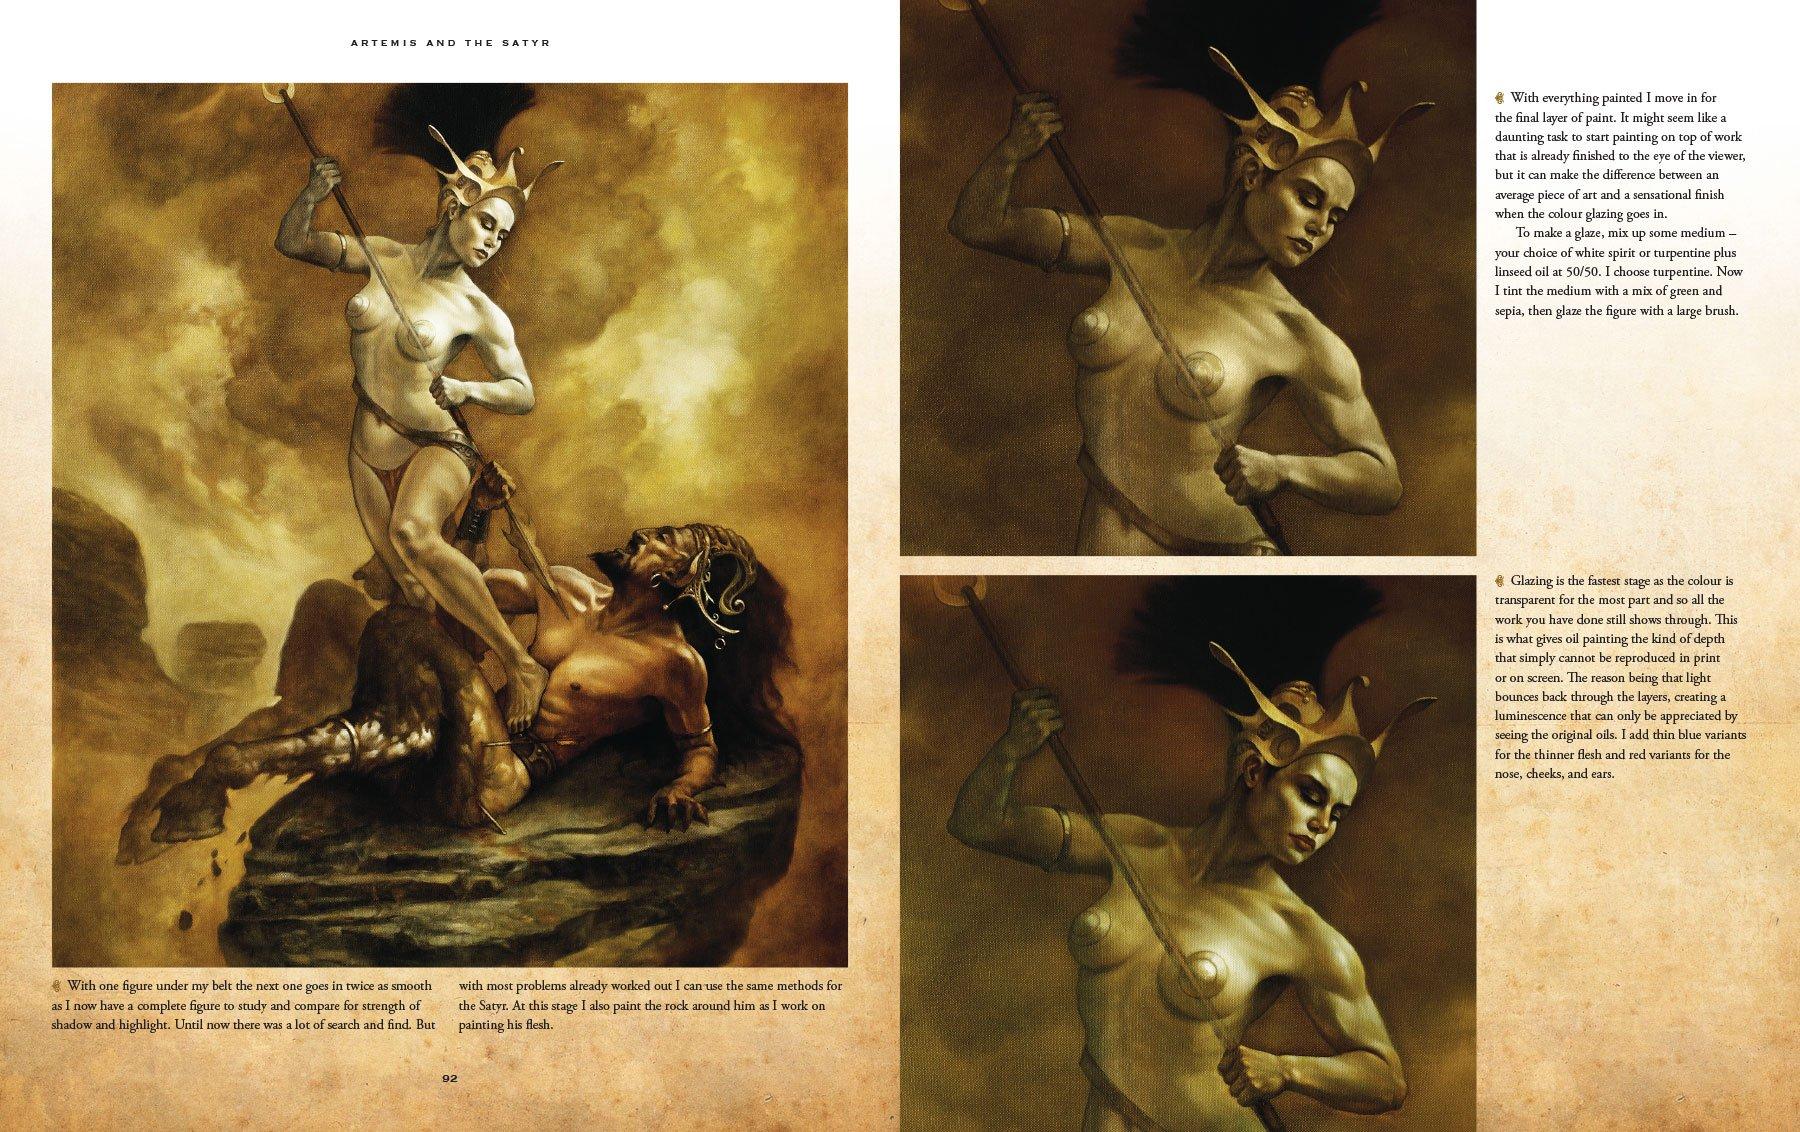 Sci Fi Fantasy Oil Painting Techniques Amazoncouk Patrick J Jones Boris Vallejo 9780957664937 Books